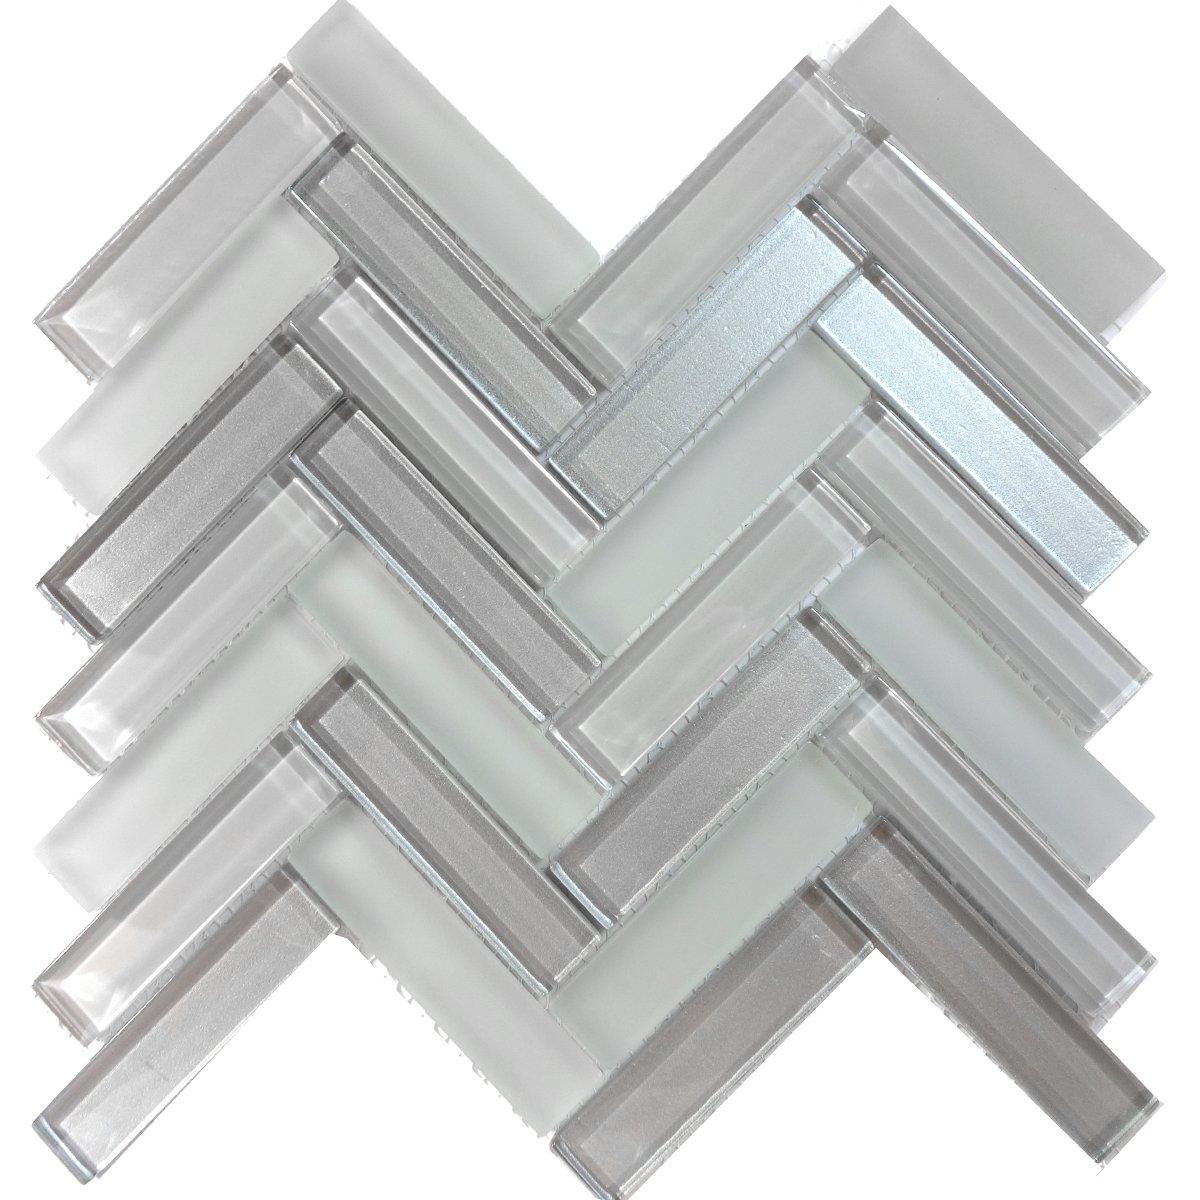 Modket TDH227MO Gray Crystal Glass Blend Metallic Cold Spray and Matted Glass Mosaic Tile Backsplash Herringbone